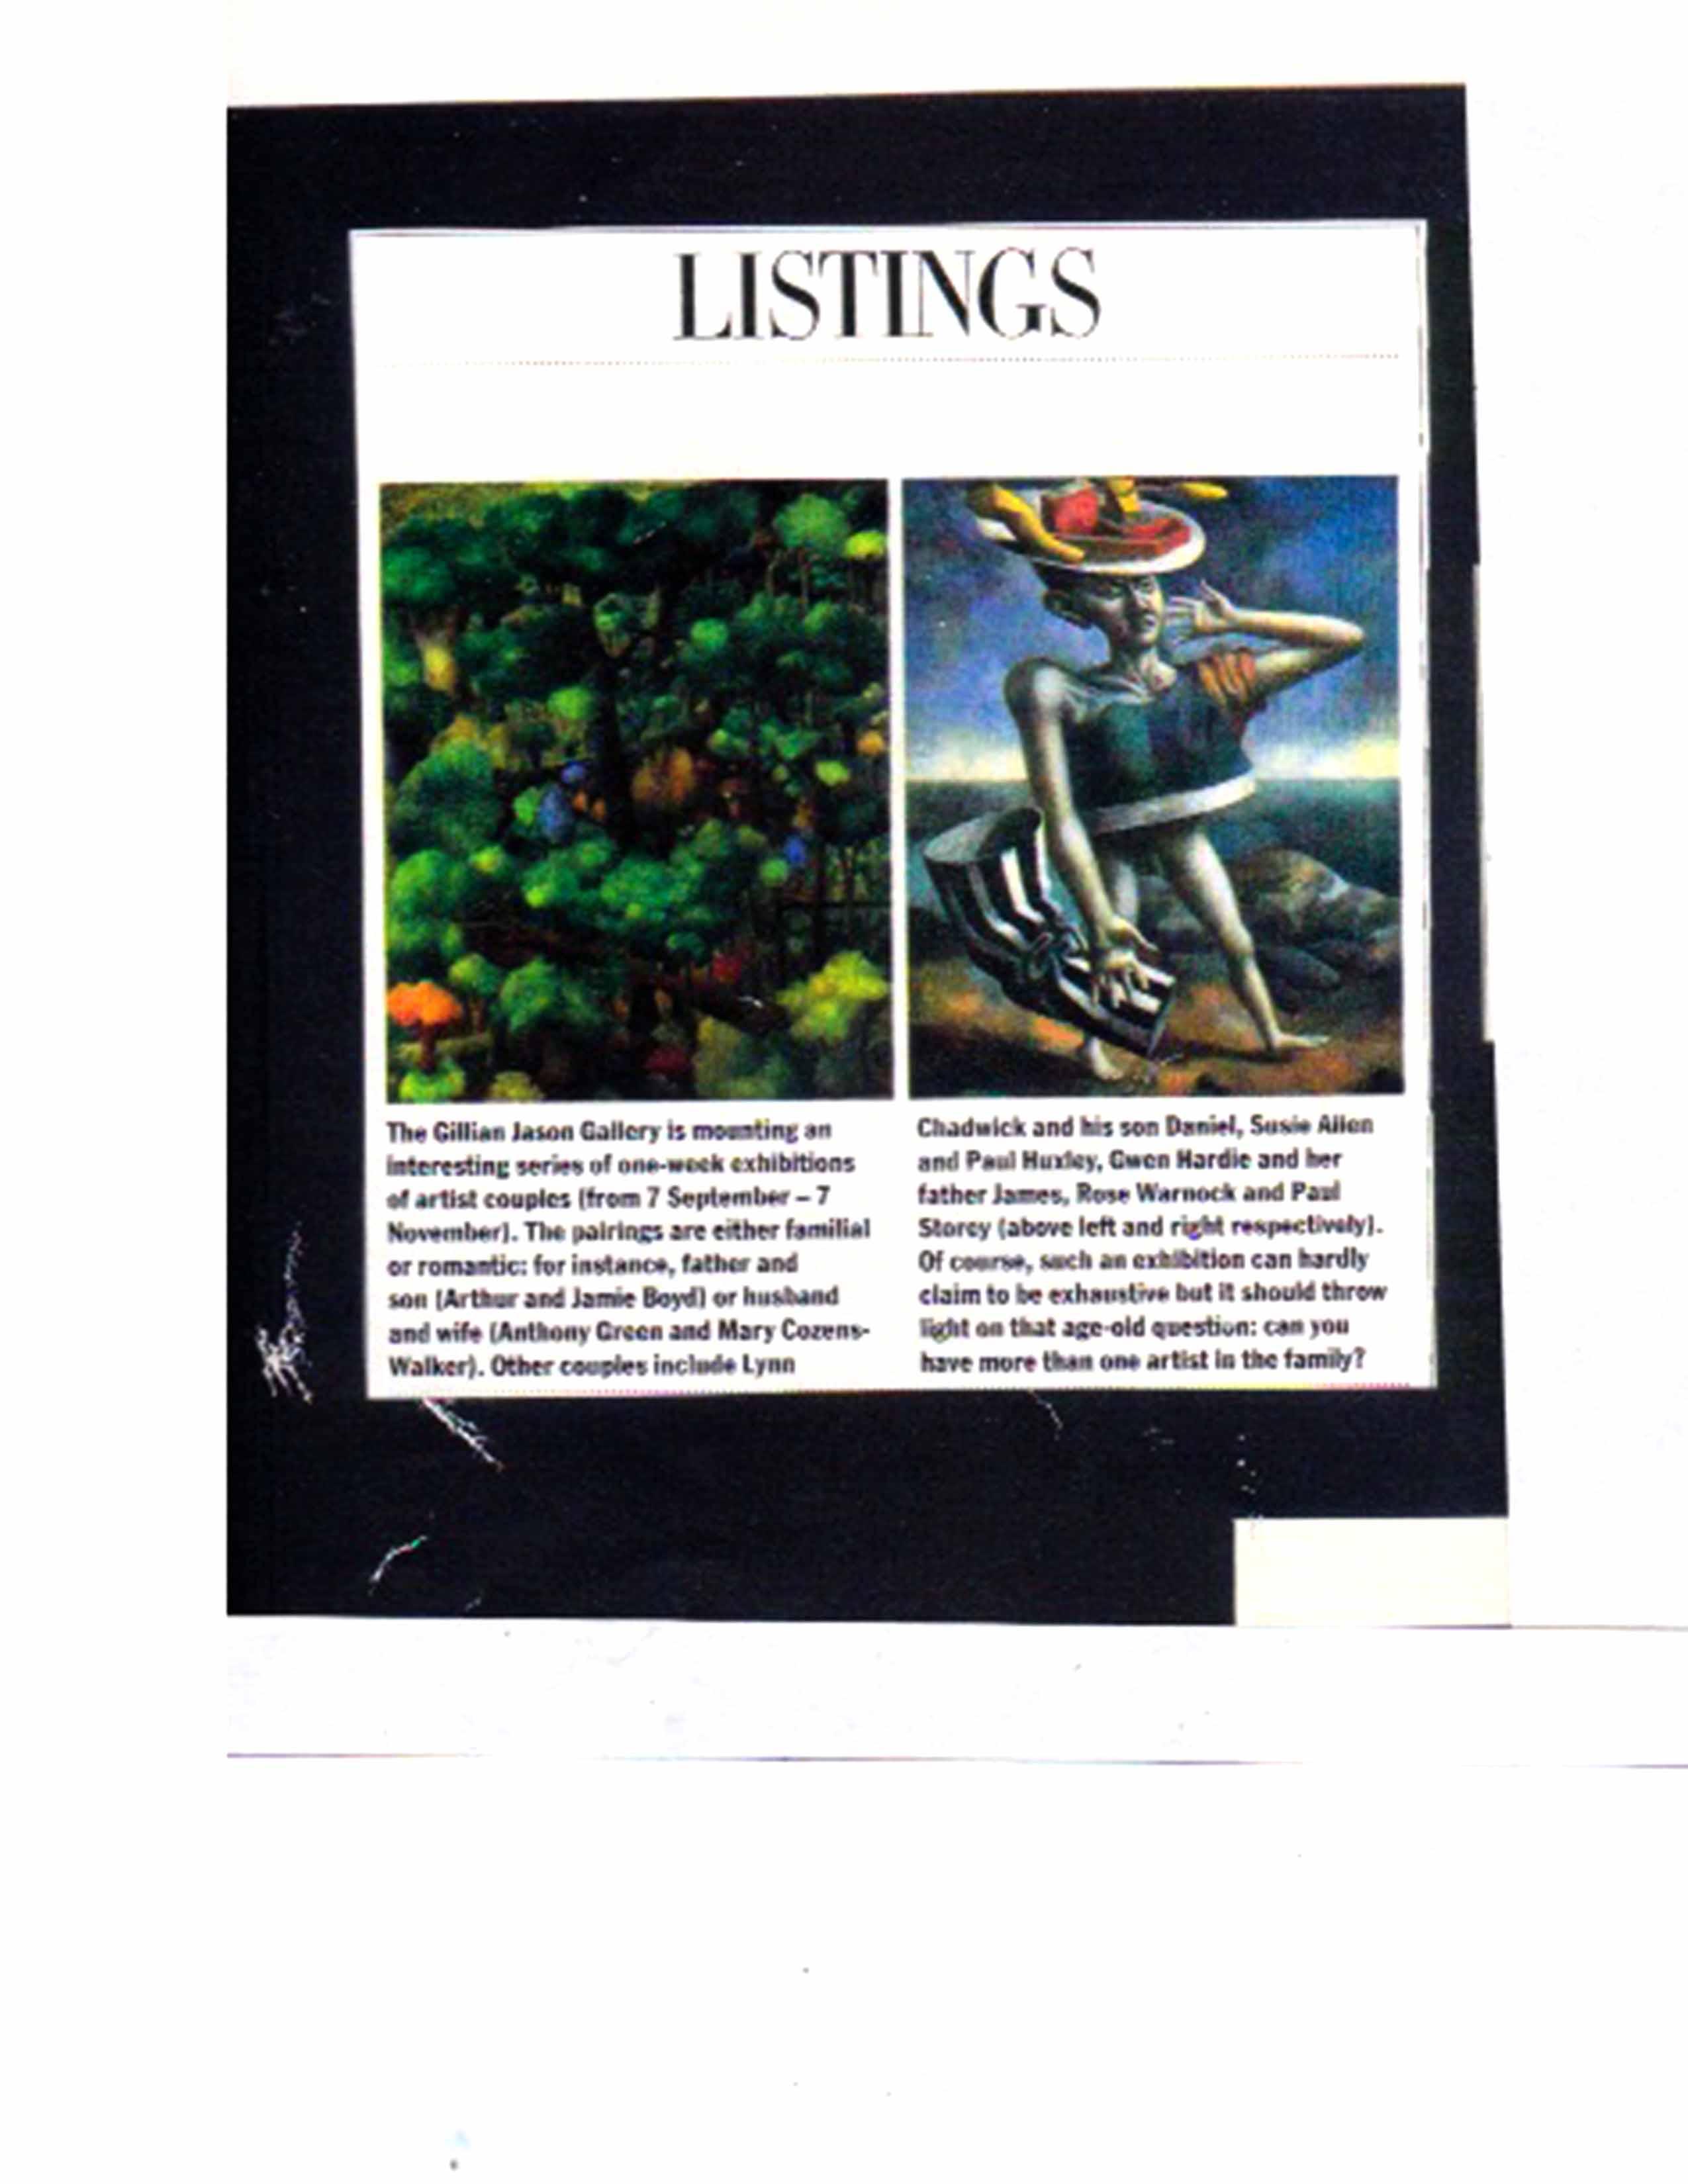 6 paul-storey-reviews-2-royal-academy-1992